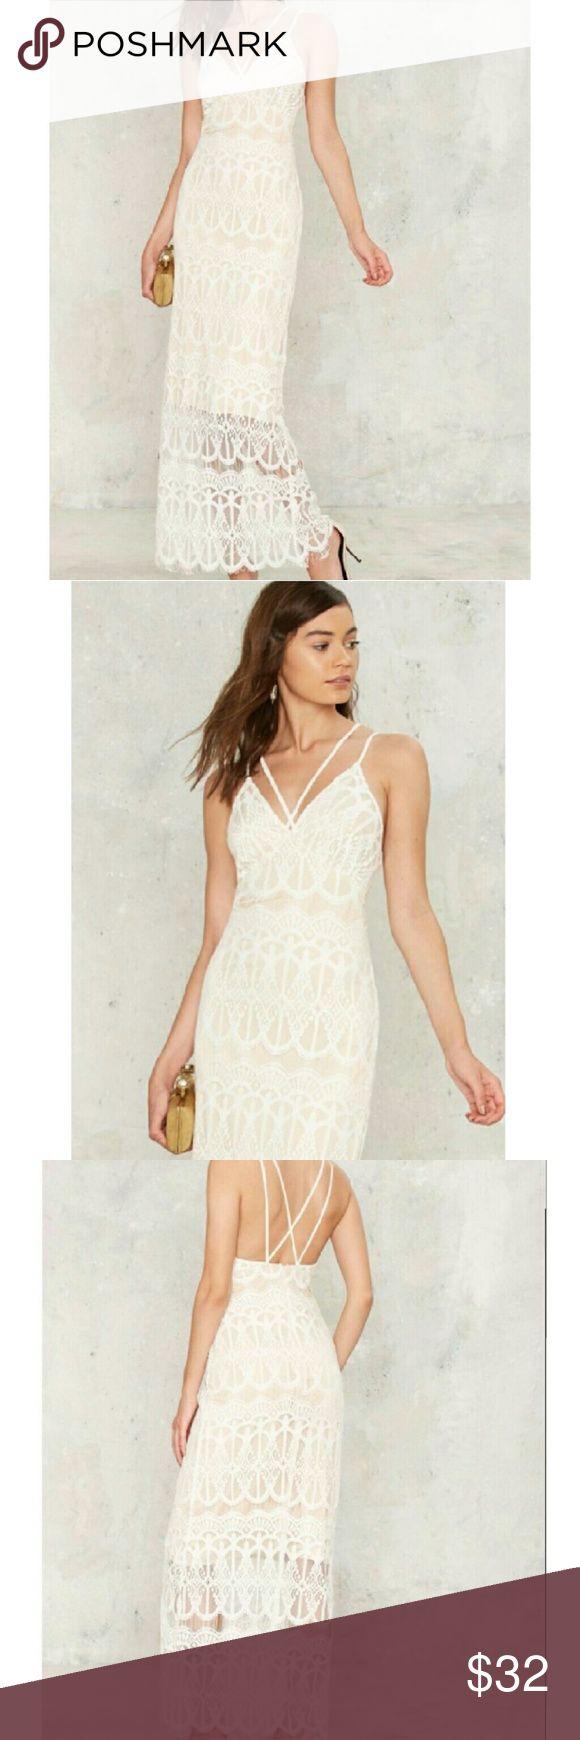 Boho tunic top blouses and dress 4009 trendy boho vintage gypsy - Gorgeous Nasty Gal Lace Dress Nwt